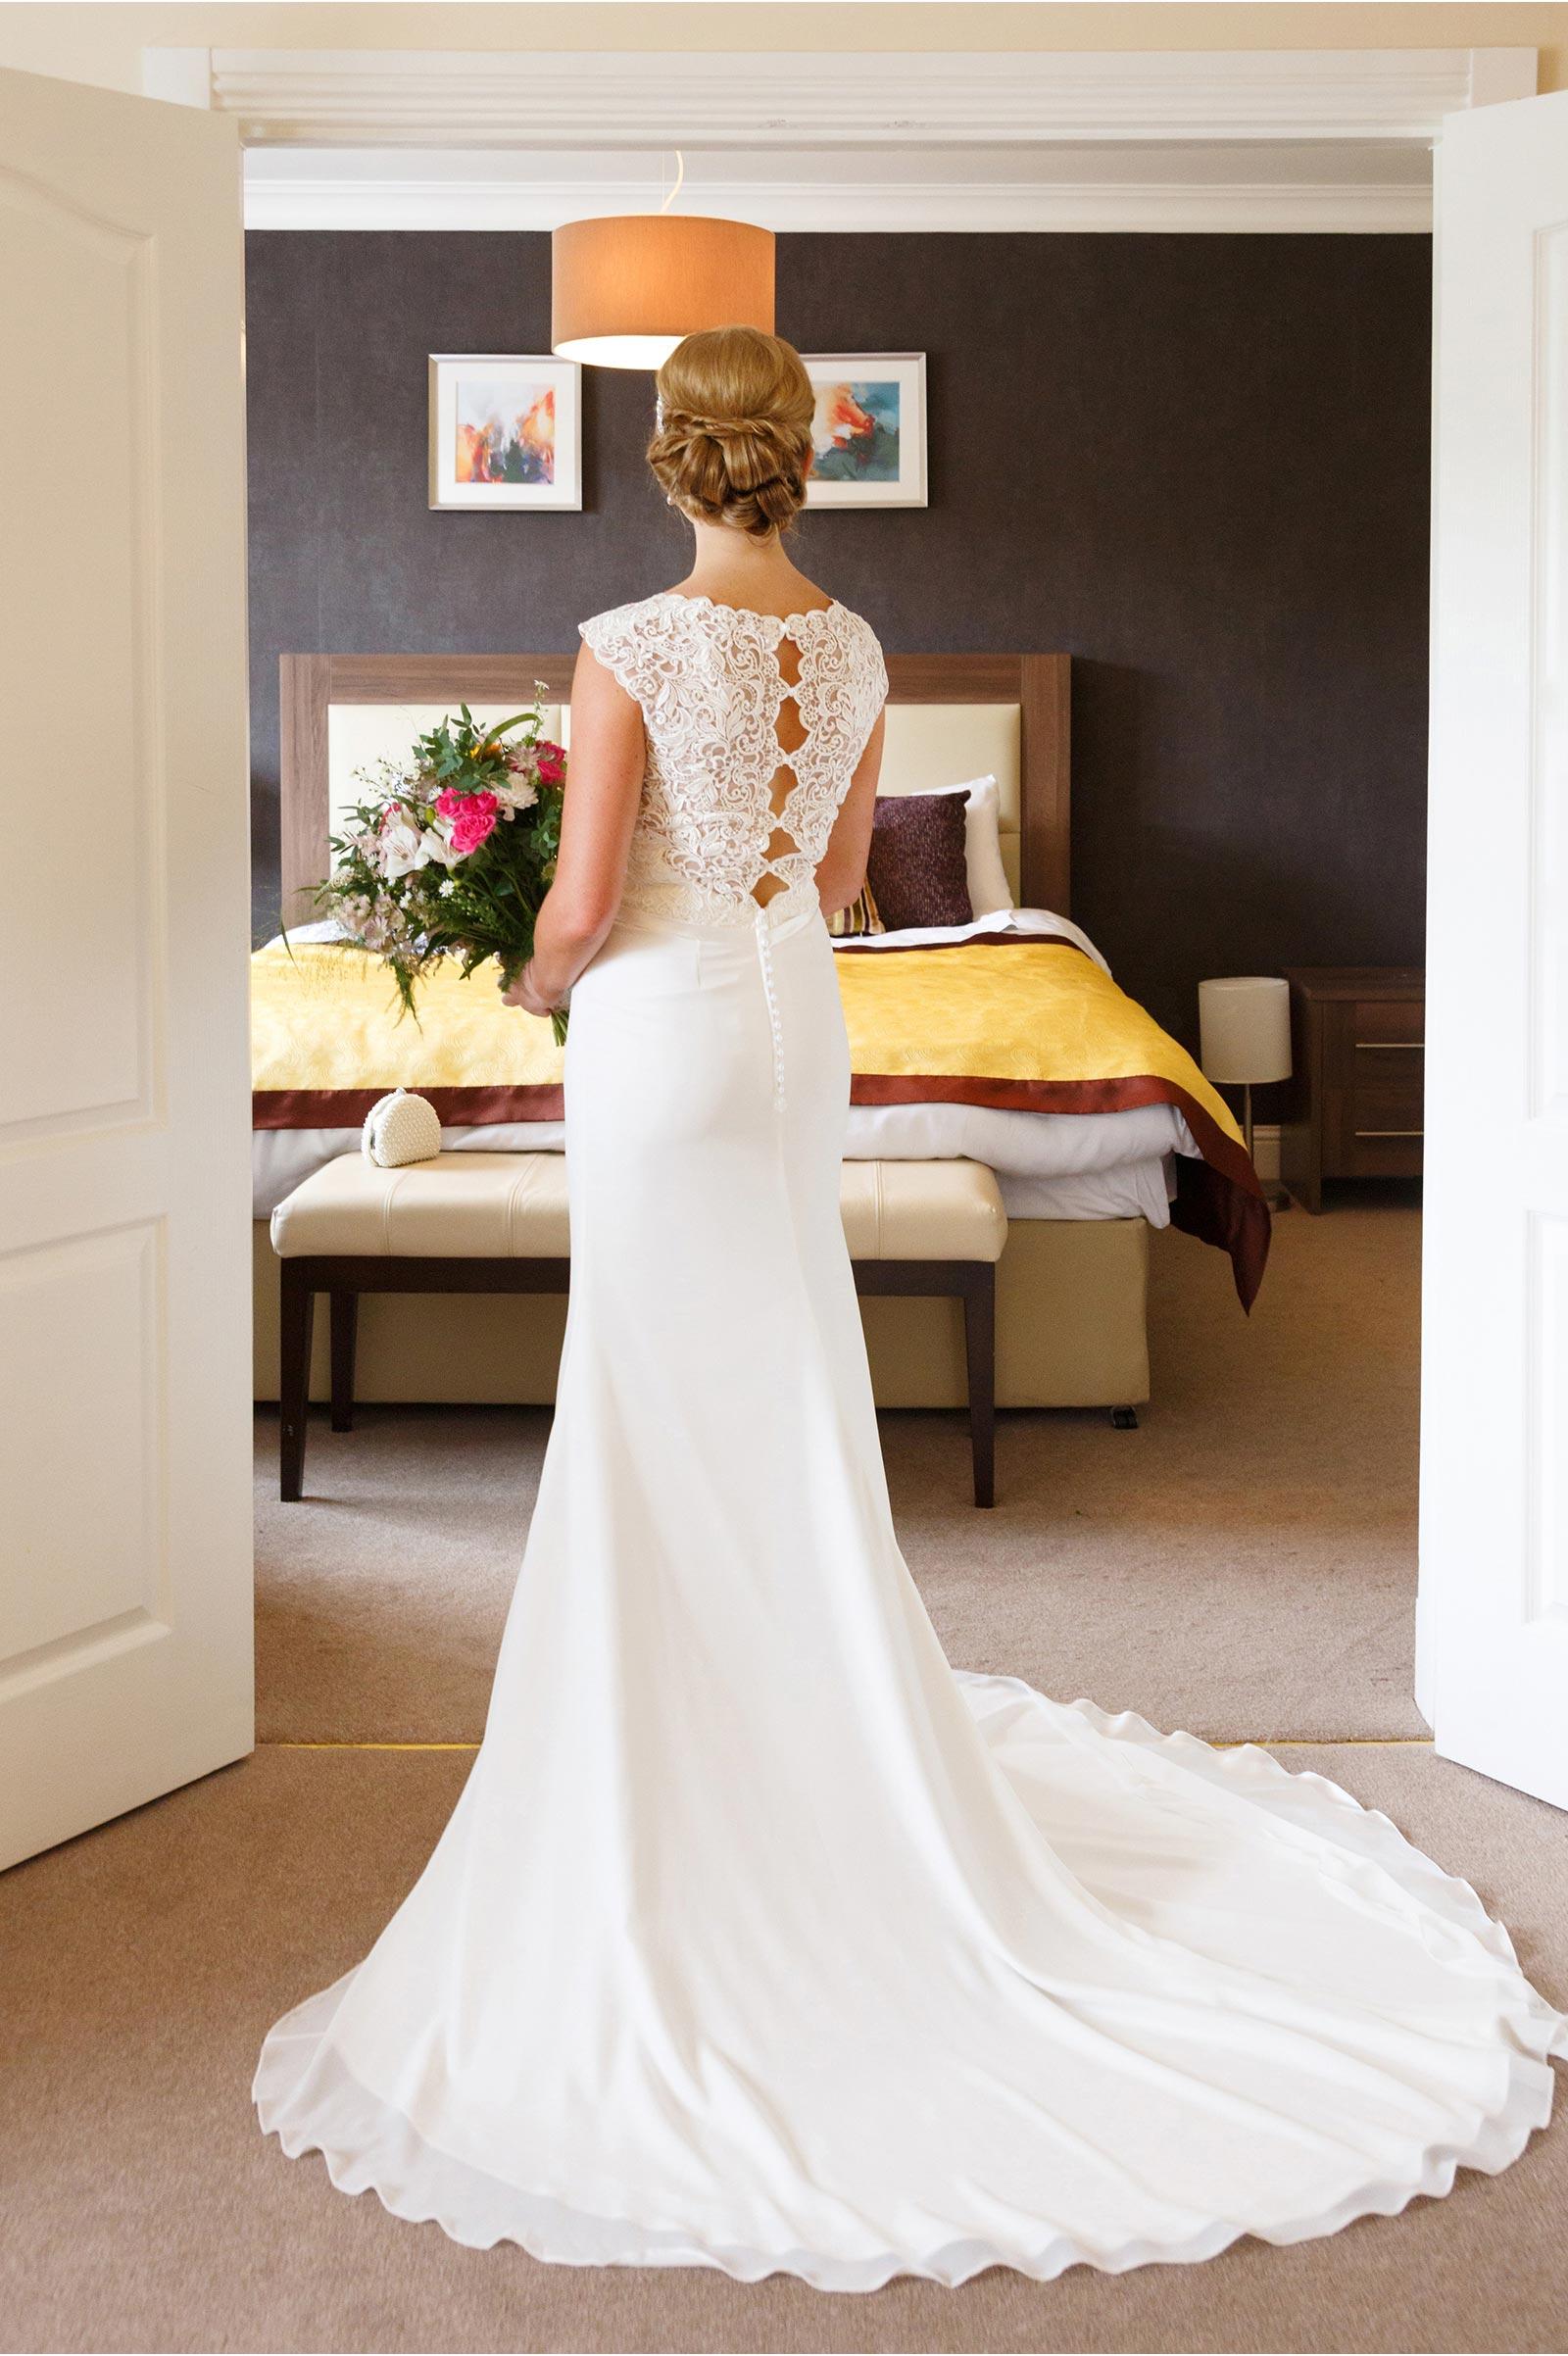 back of dress bridal bliss blackpool kingsley hotel cork